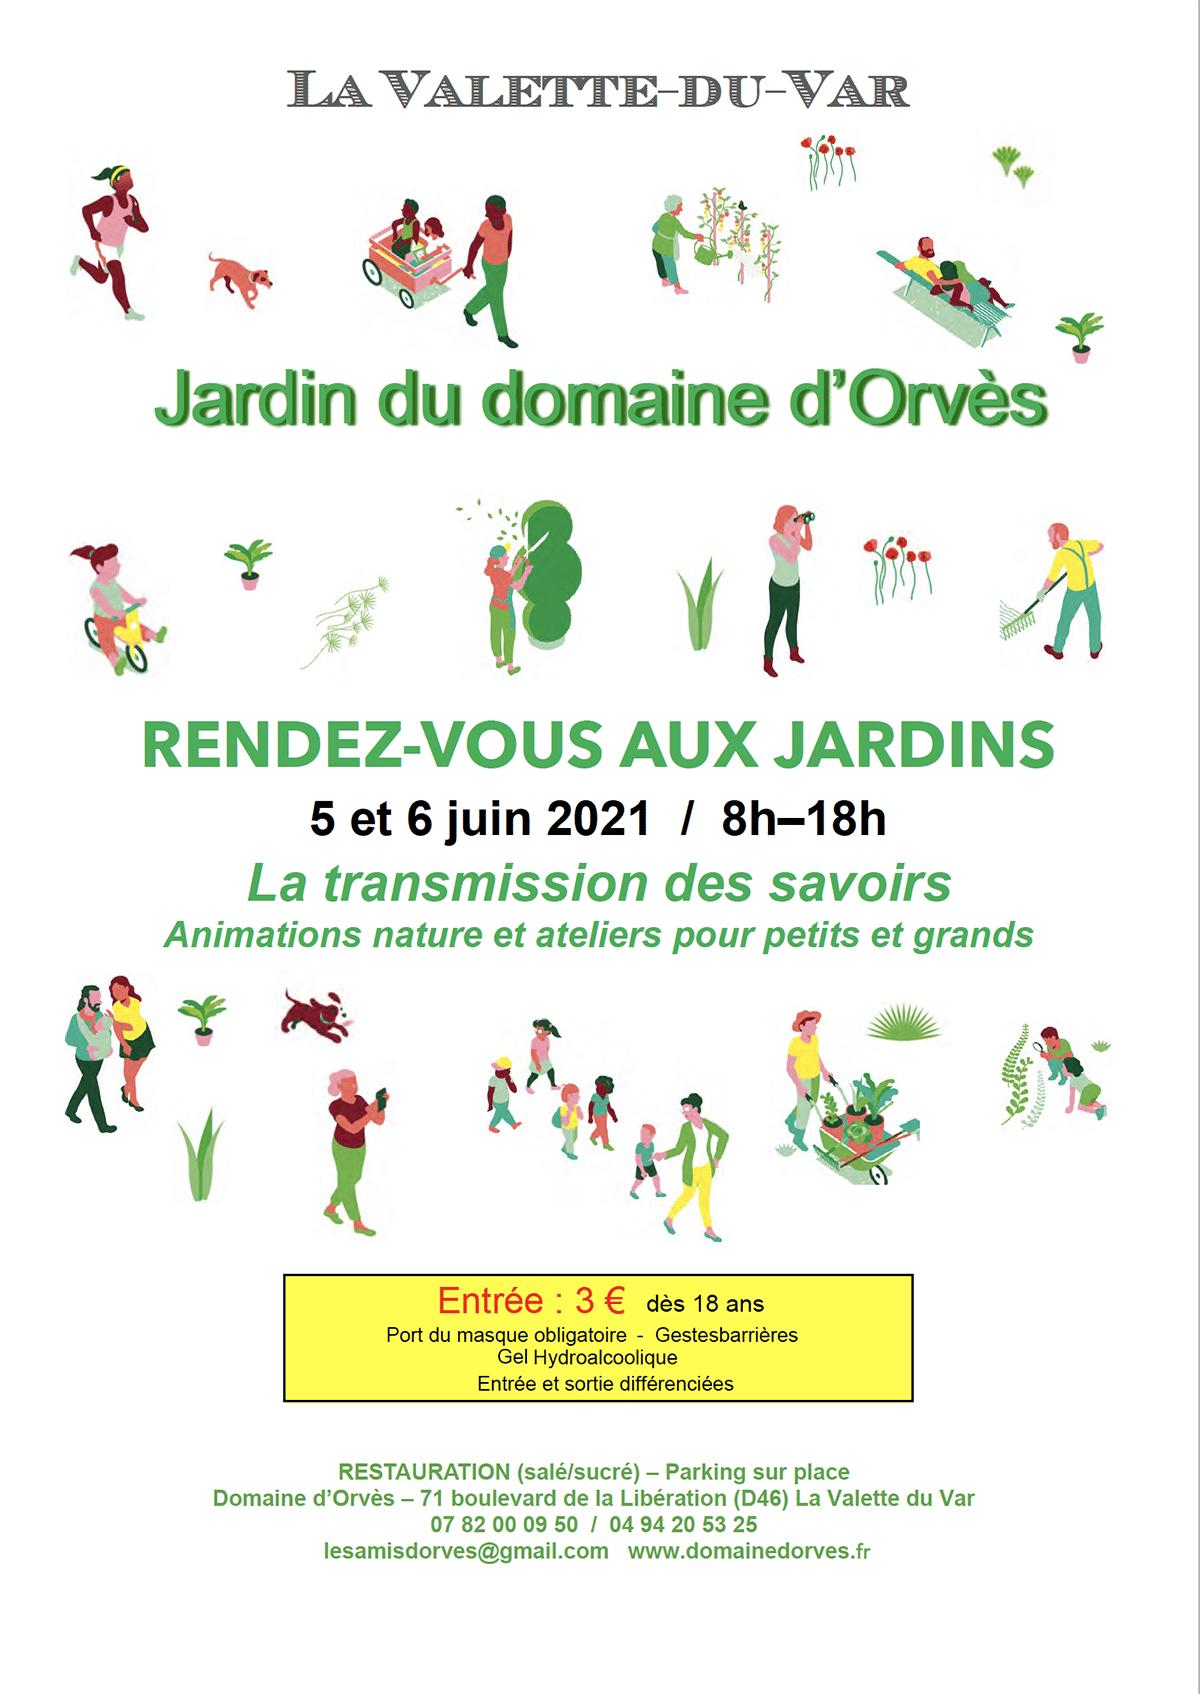 rdv-jardin-domaine-d-orves